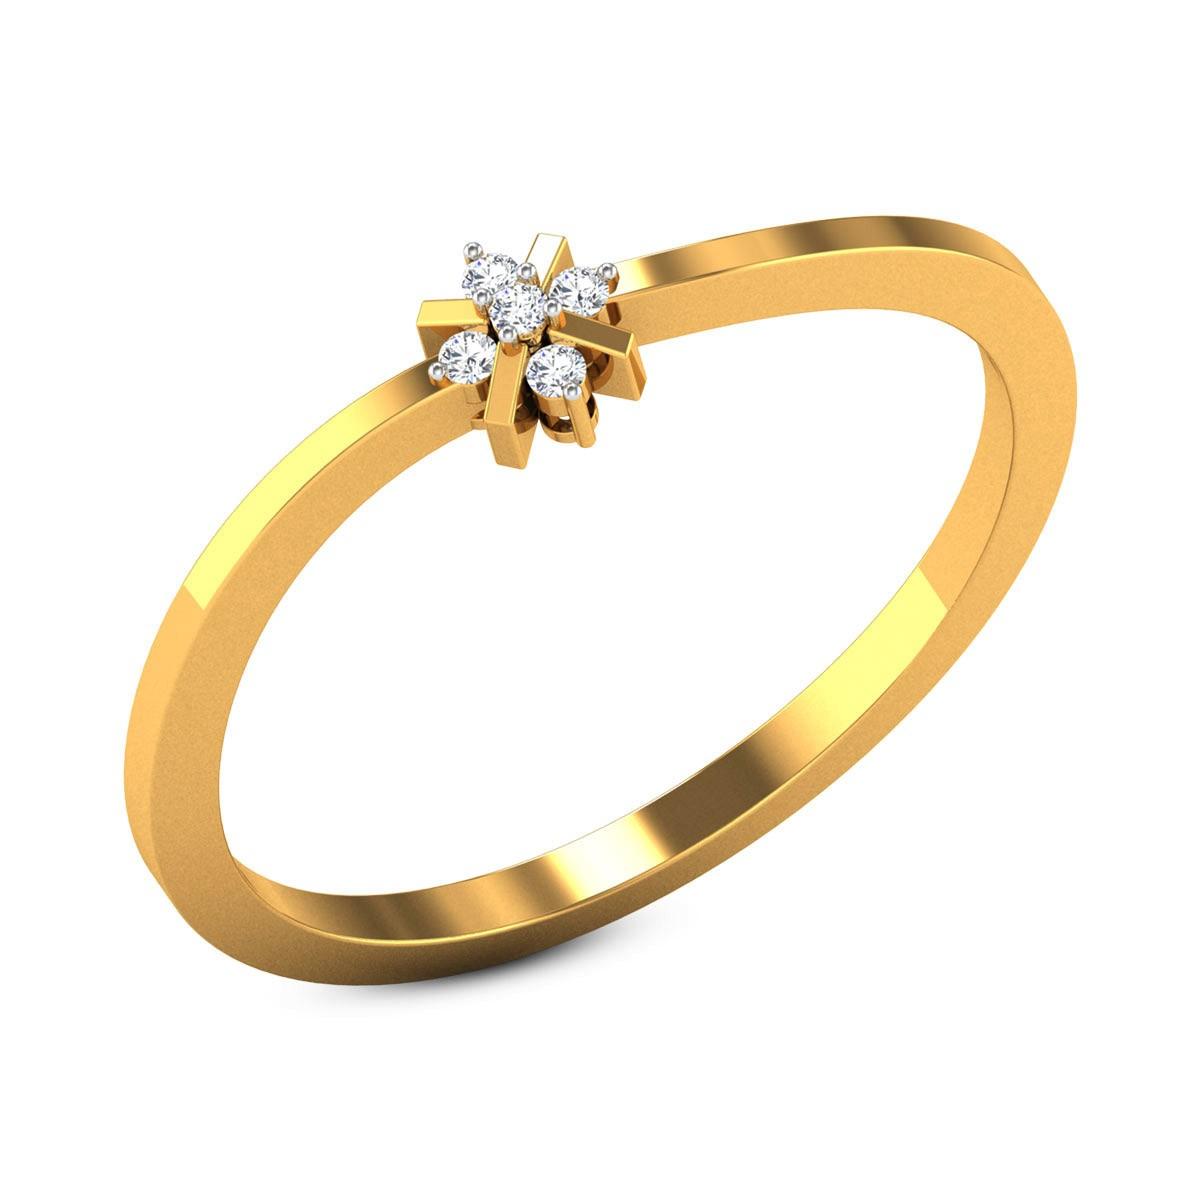 Verner Diamond Floral Ring